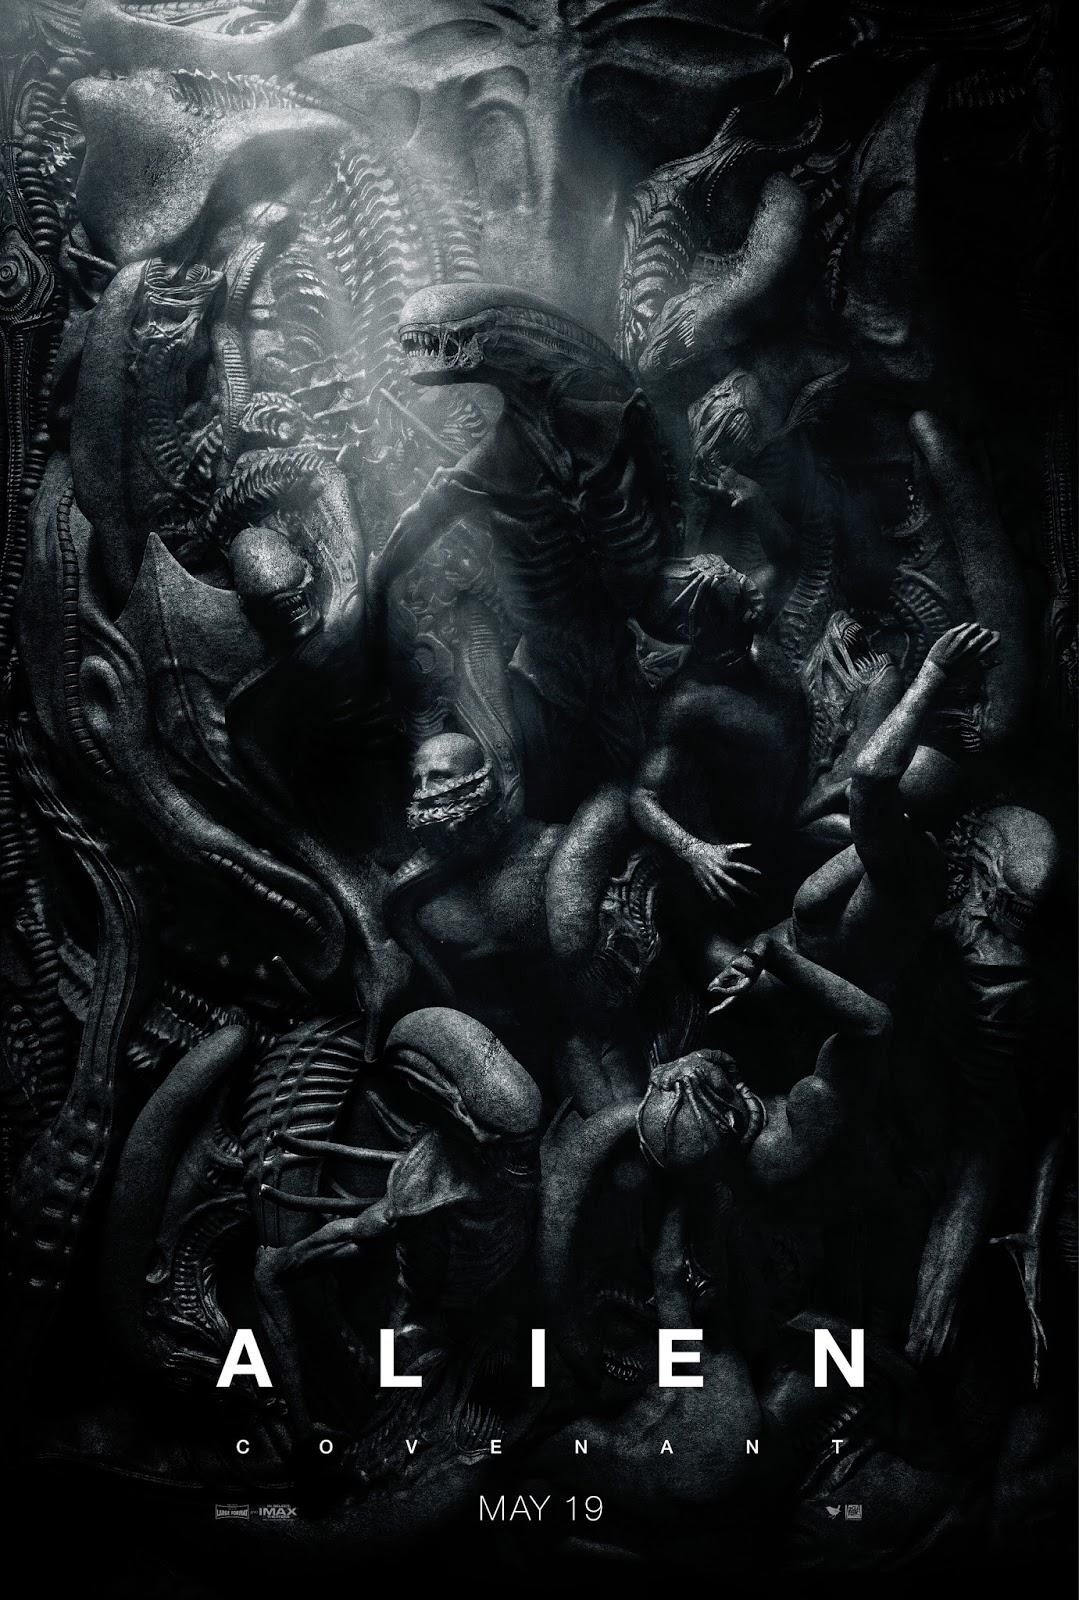 Чужой Завет, Alien Covenant, Чужой, Alien, SciFi, фантастика, Horror, ужасы, хоррор, постер, poster